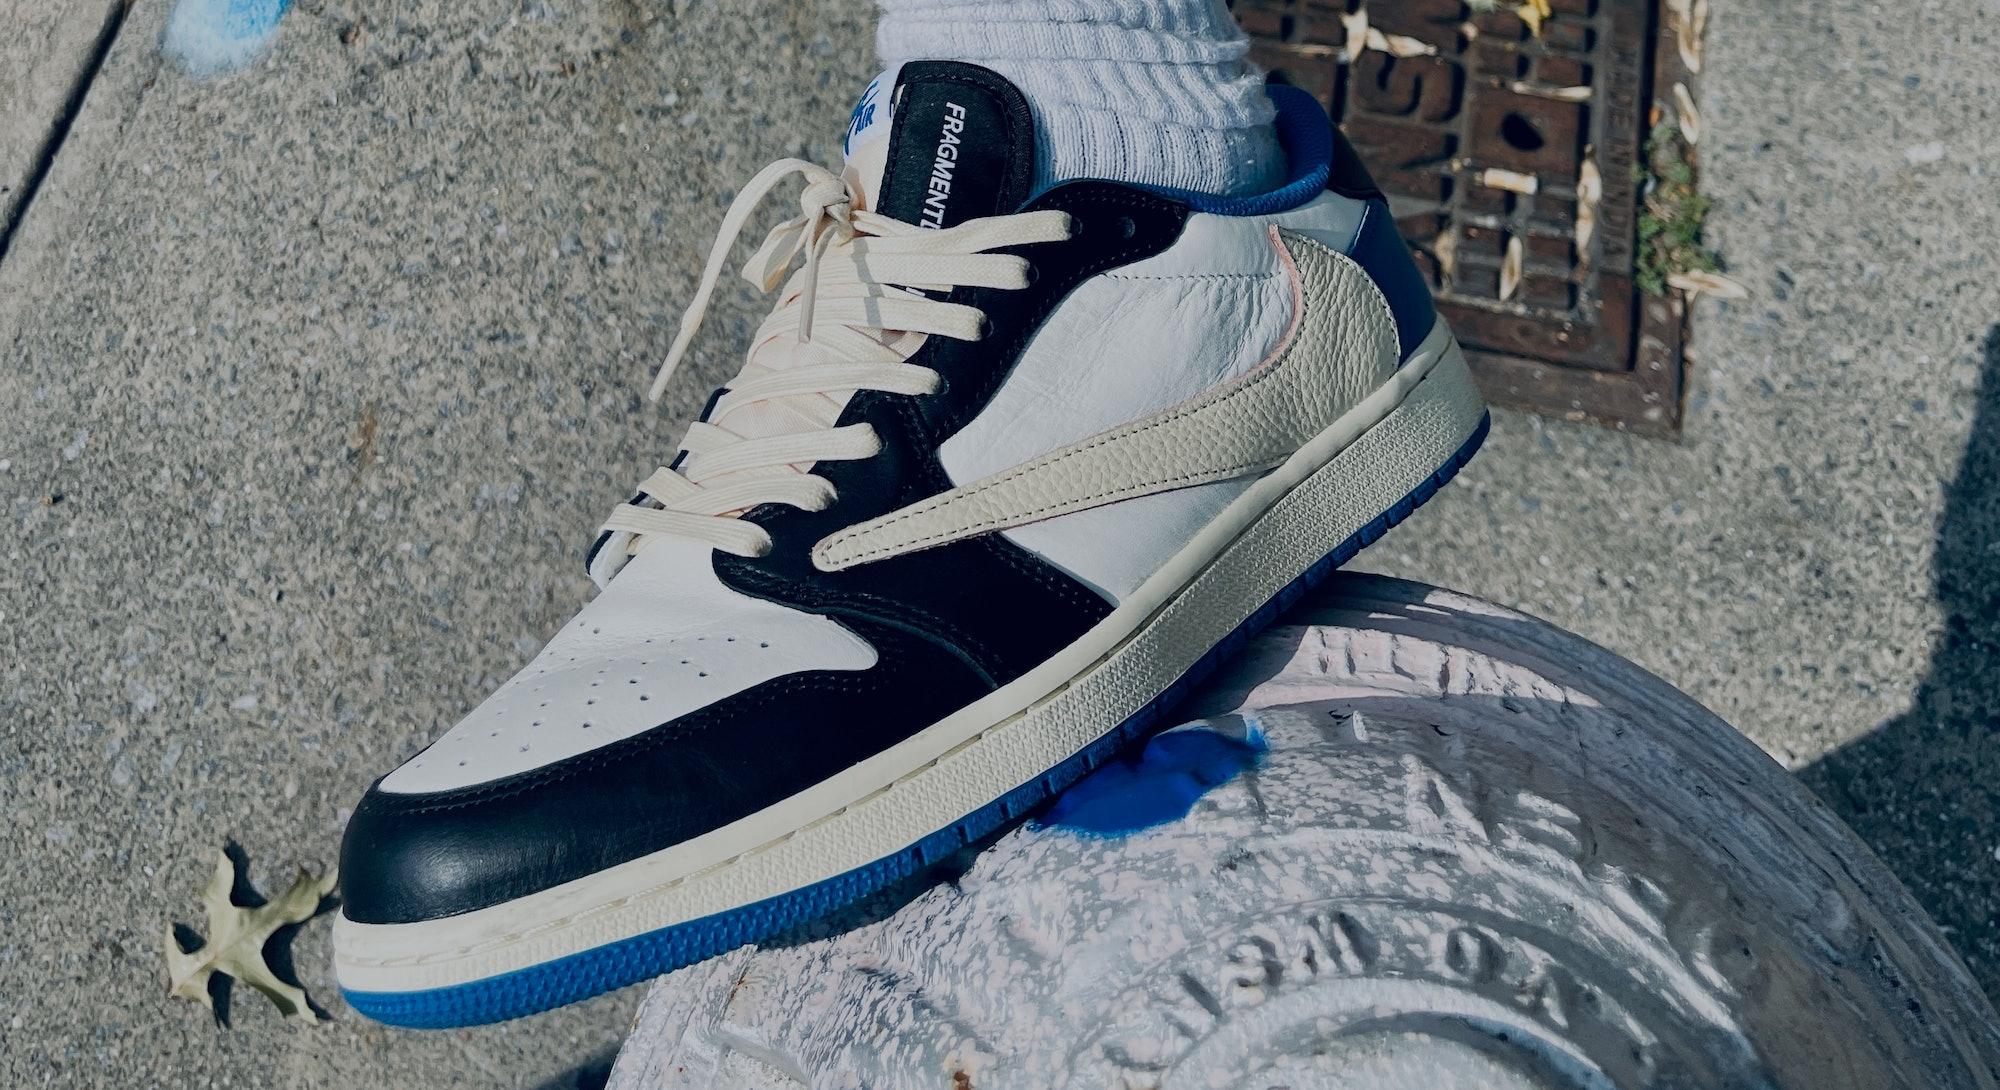 Nike Travis Scott x Fragment Design Air Jordan 1 Low review on feet